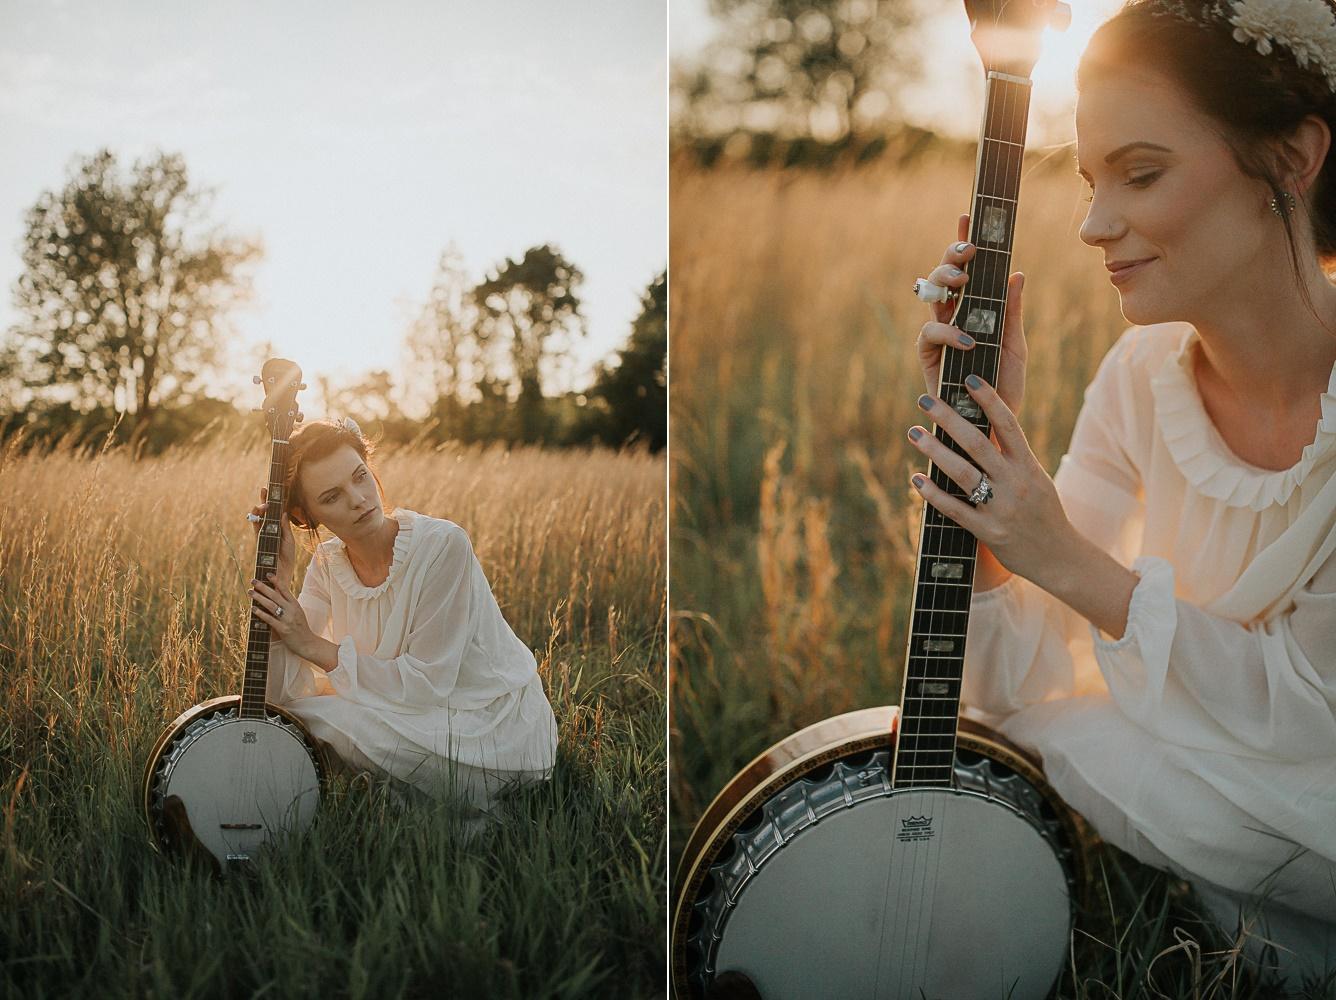 Cassie Cook Photography-Memphis TN-portrait and wedding photographer -7188-horz.jpg